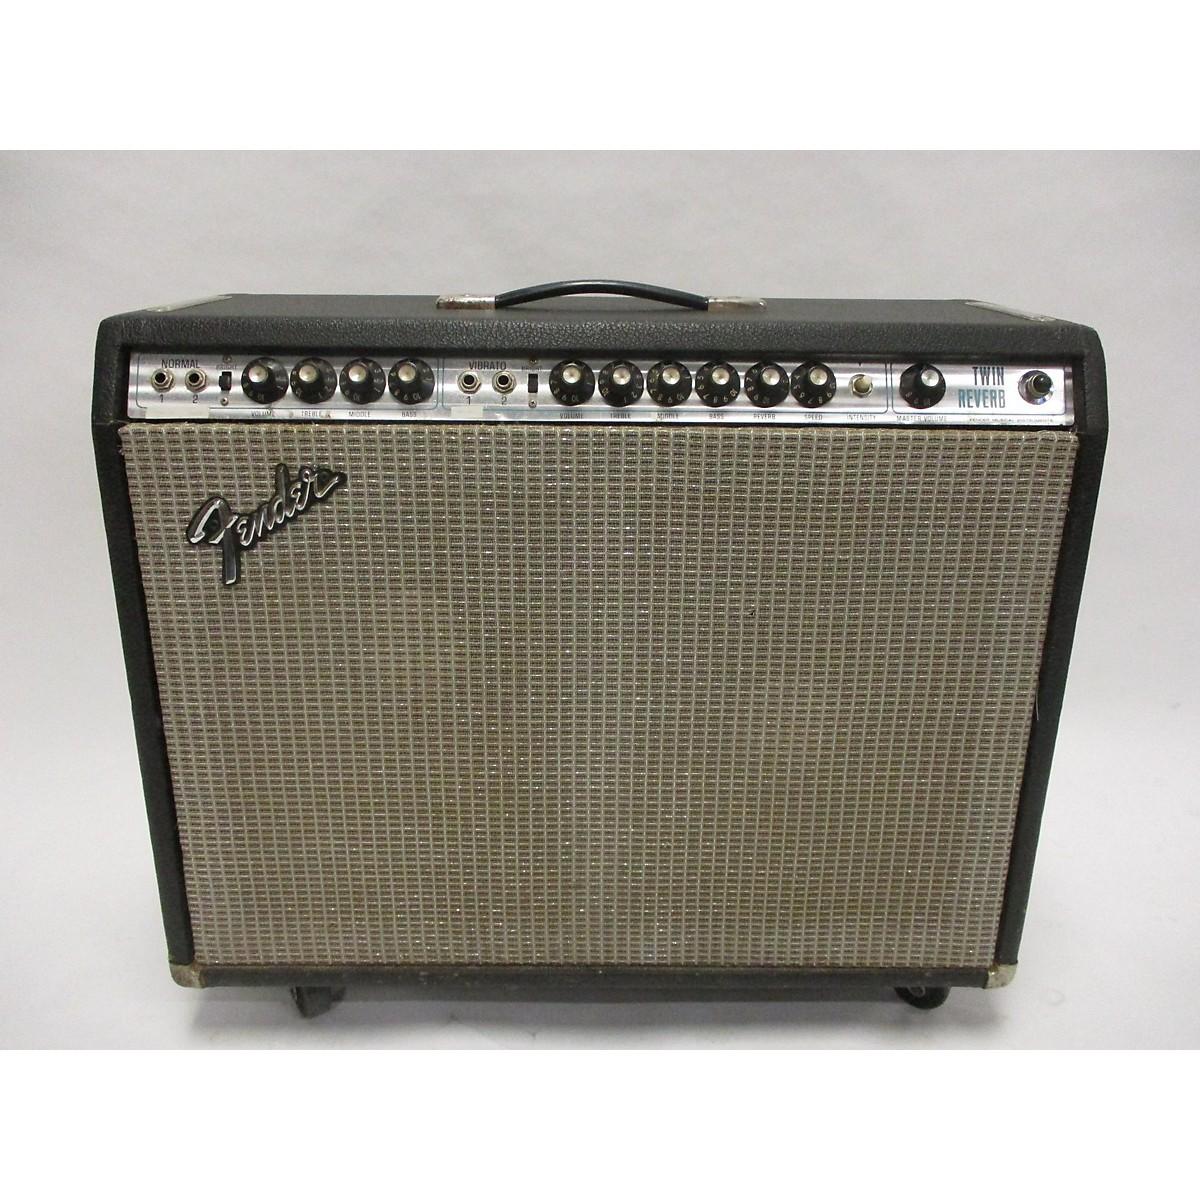 Fender 1975 Twin Reverb 2x12 Tube Guitar Combo Amp